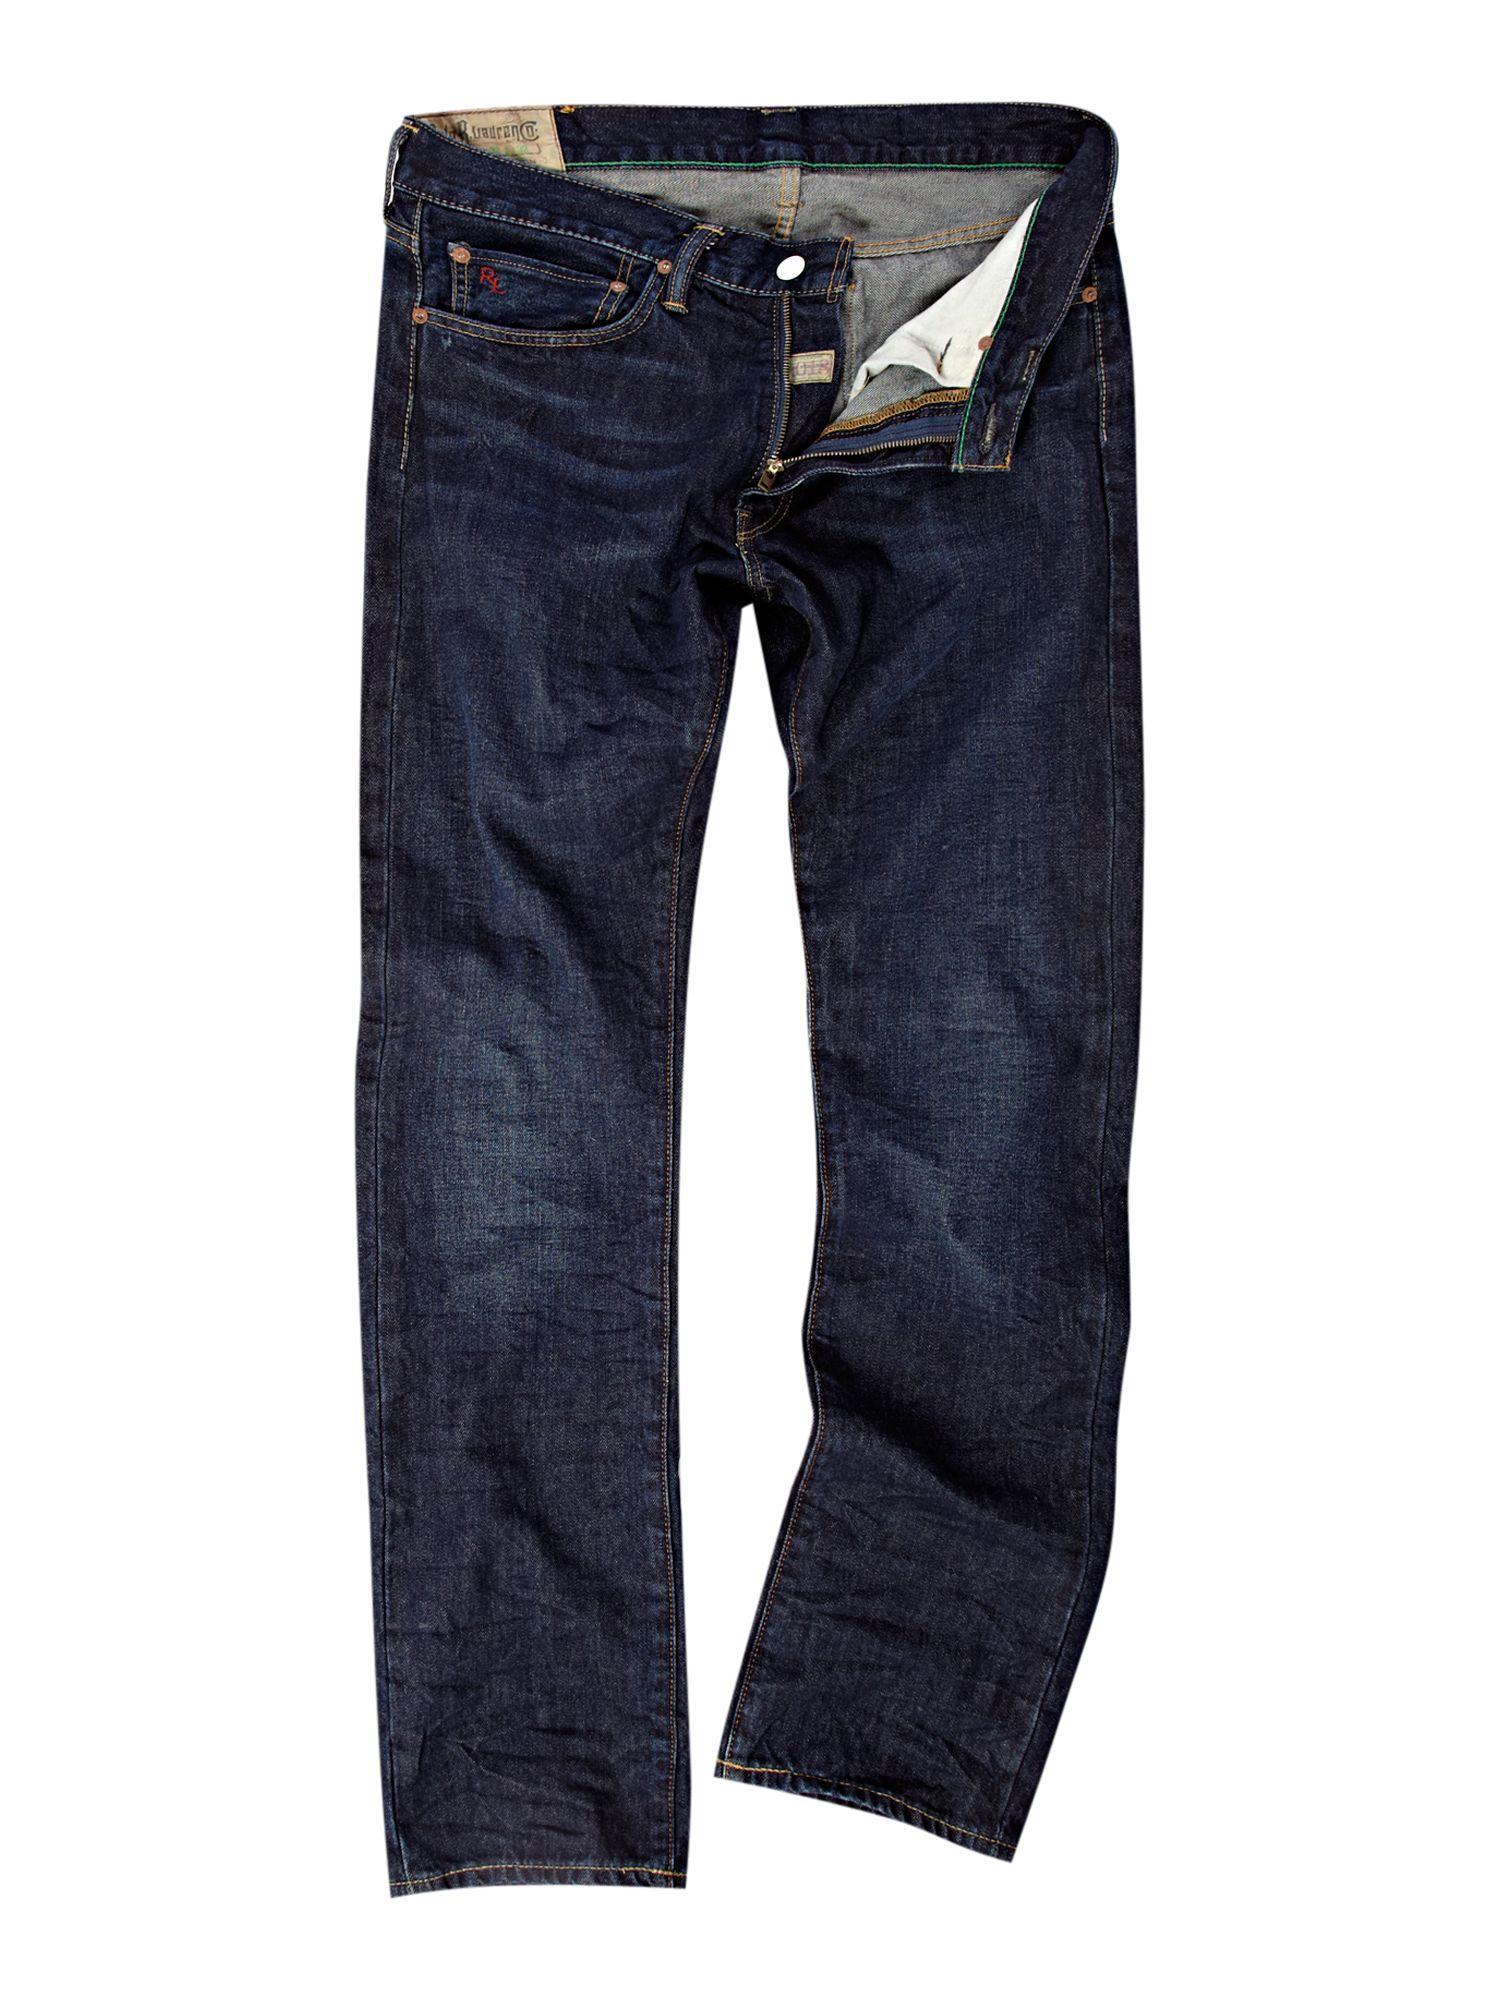 polo ralph lauren slim fit antique indigo jean in blue for. Black Bedroom Furniture Sets. Home Design Ideas